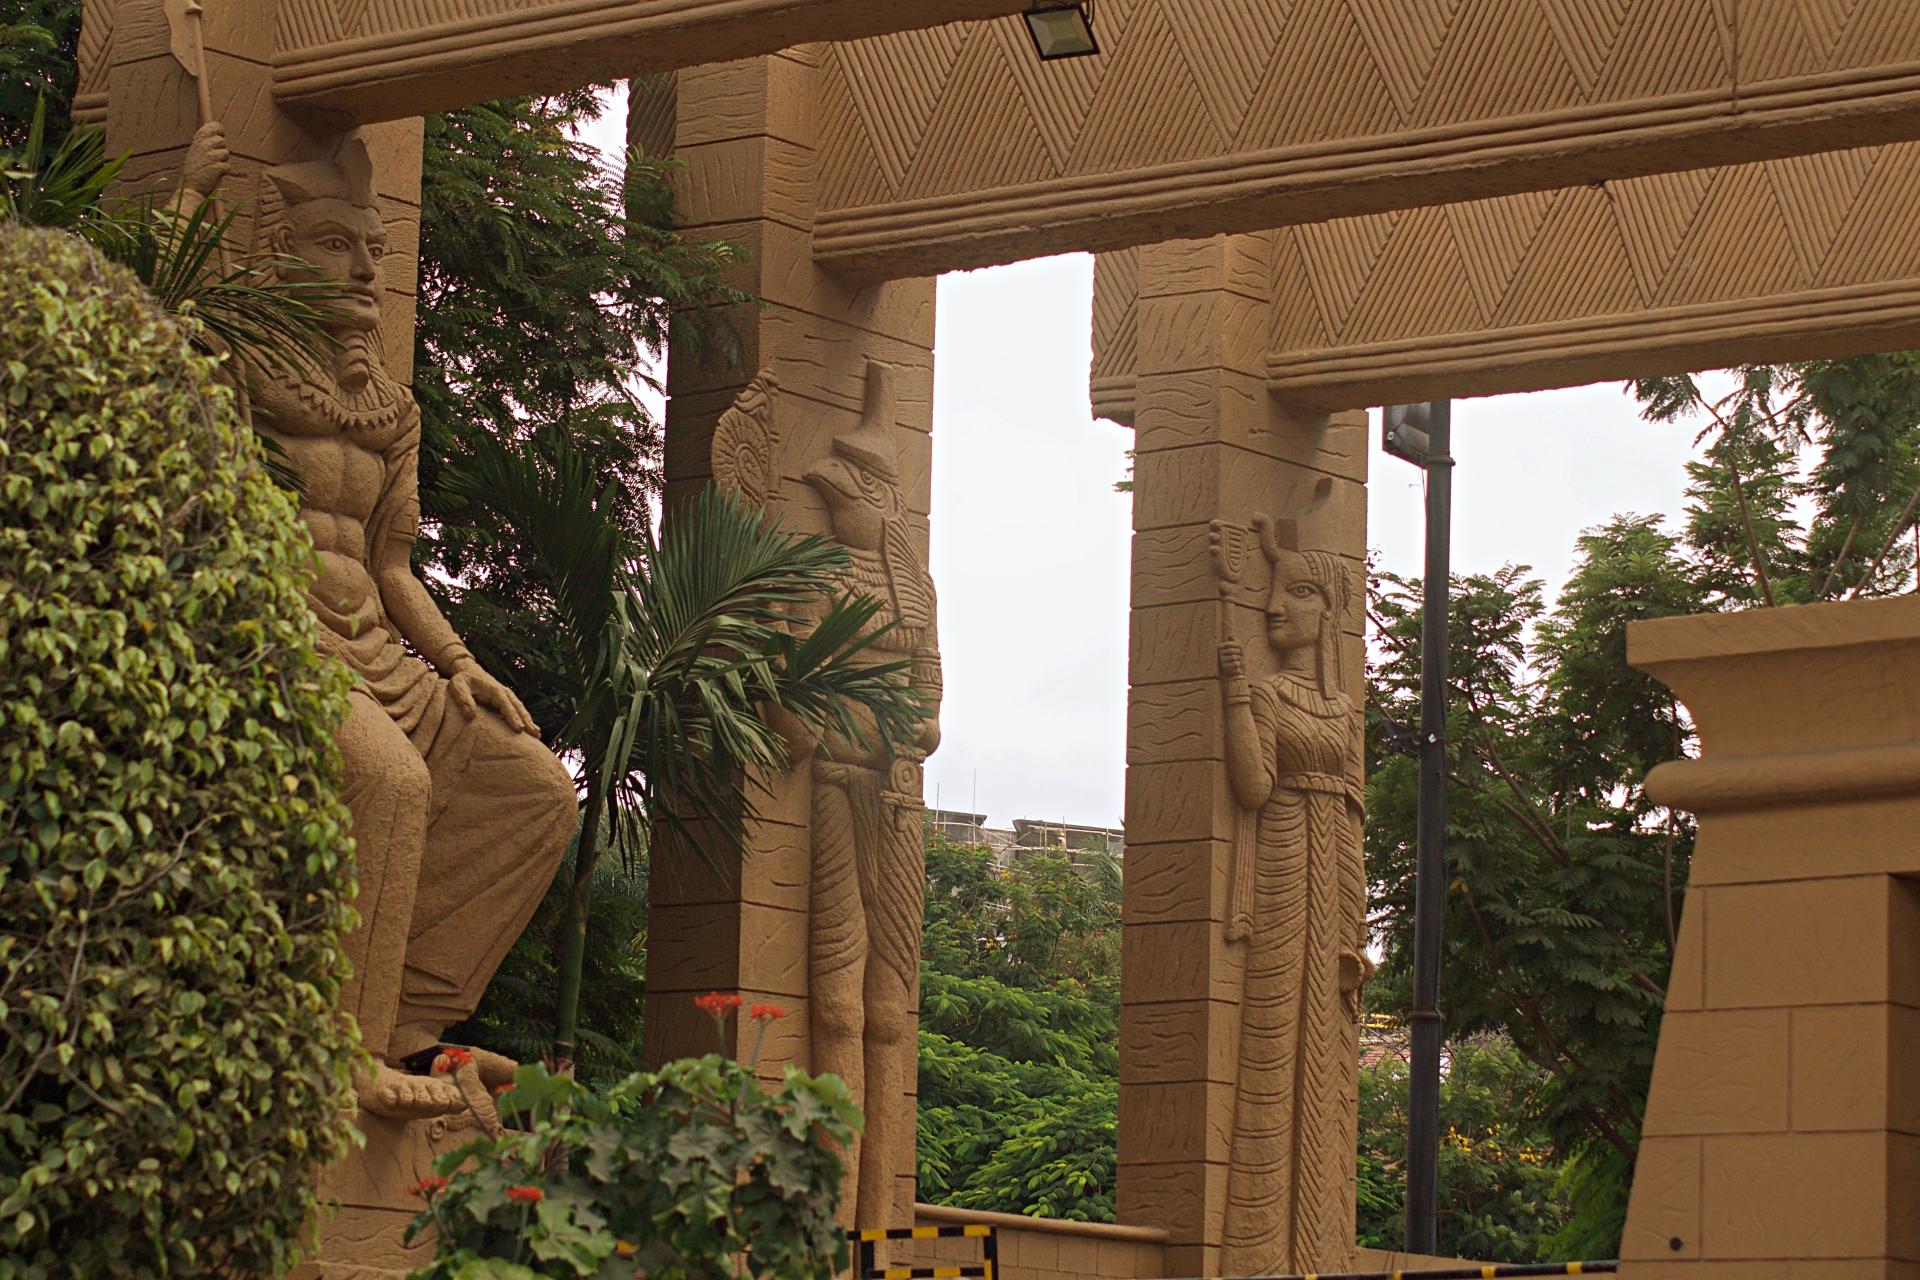 Egyptian Architecture The Corinthians Pune